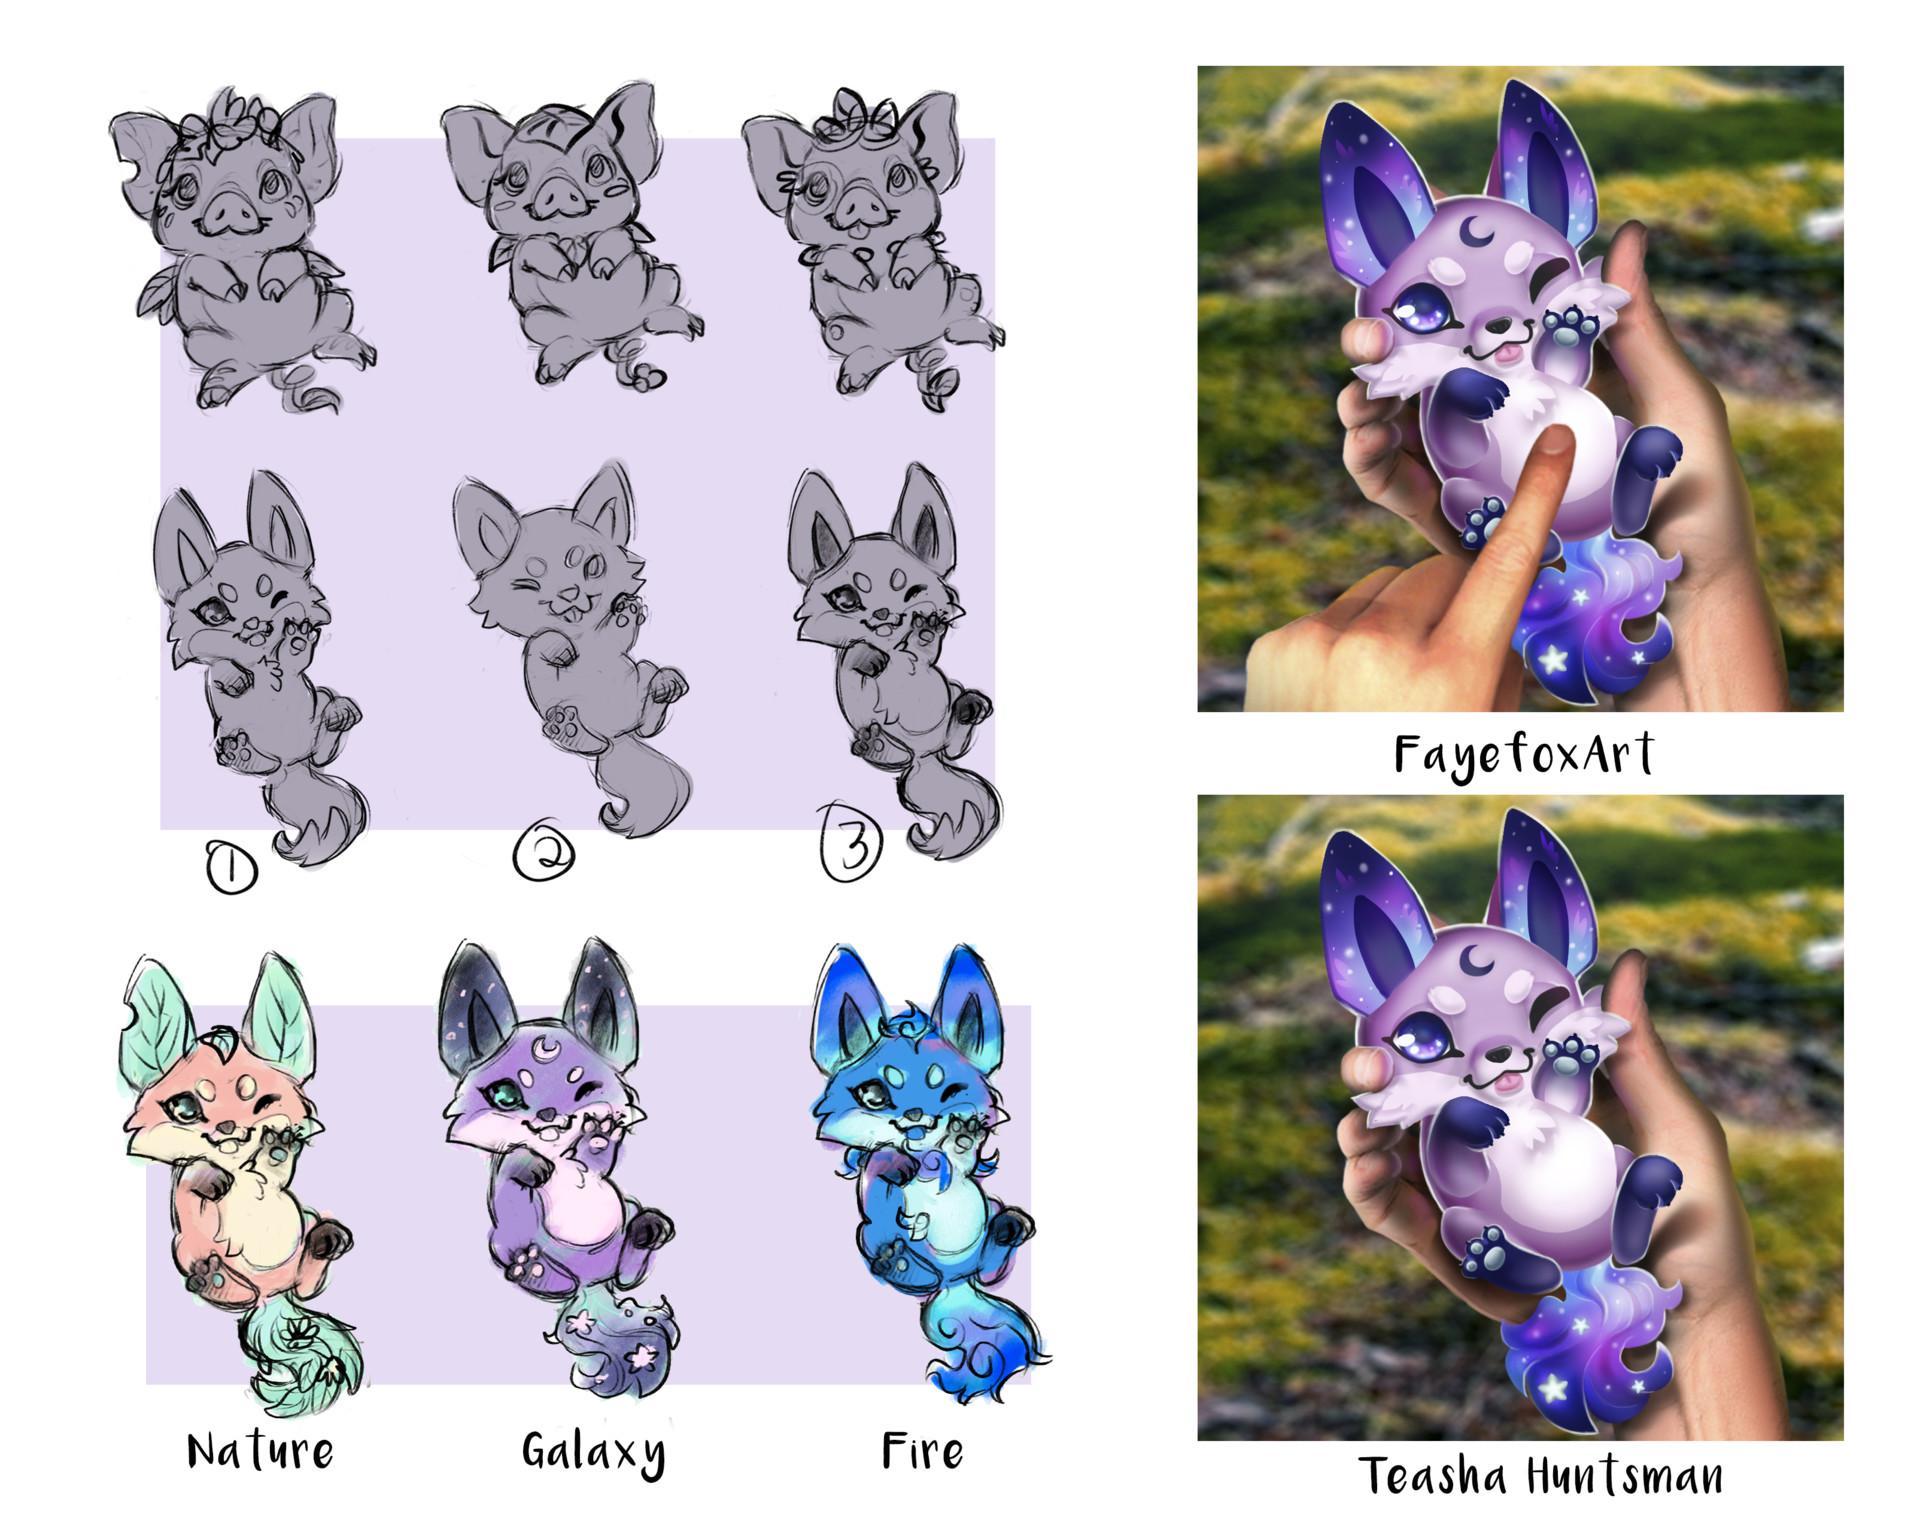 Faye fox huntsman monster arttest concept